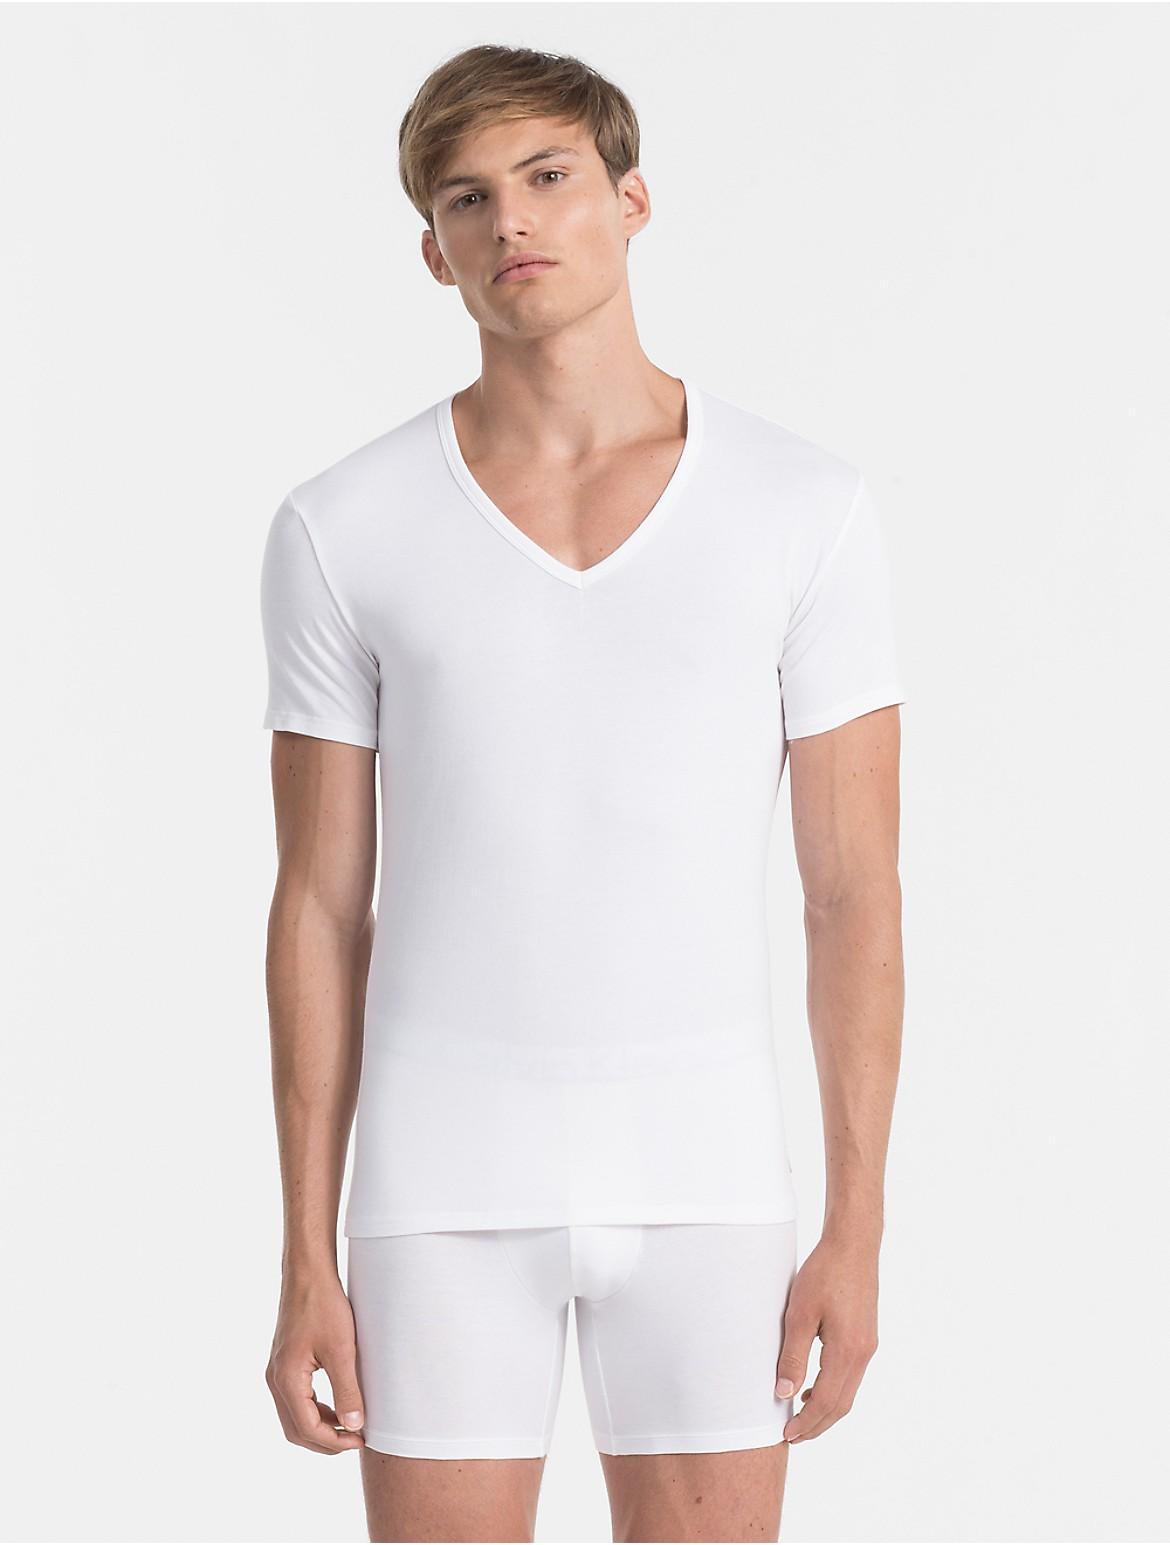 cotton stretch 2-pack v-neck t-shirt   Calvin Klein 2a3a229e55